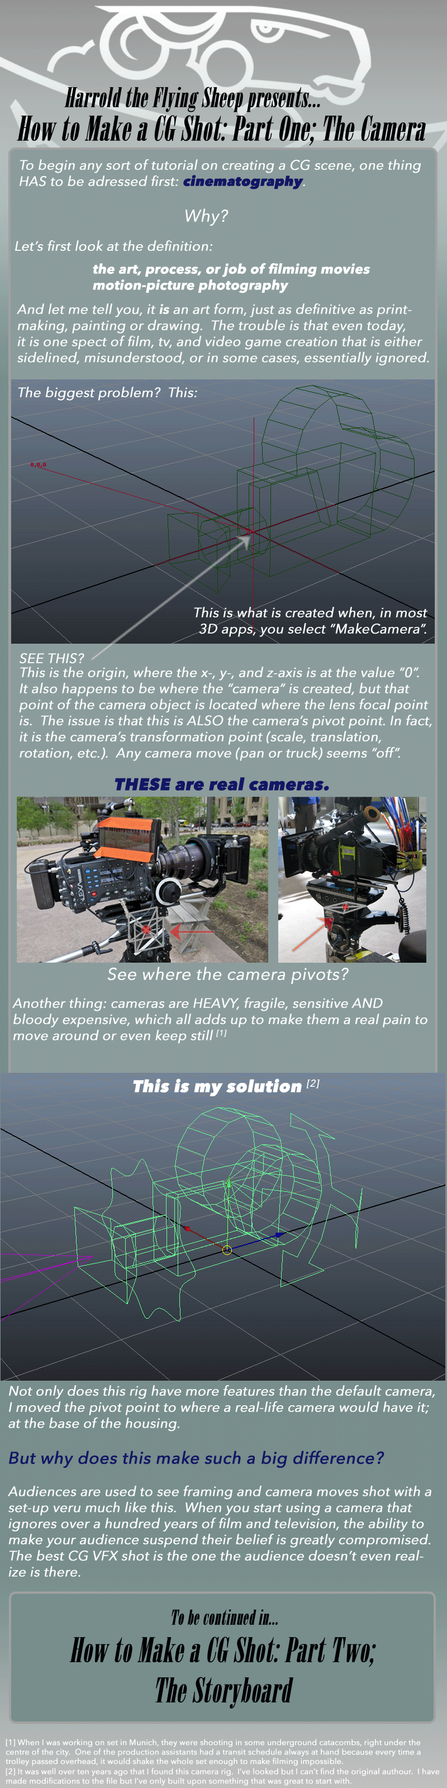 How to Make a CG Shot: Part 1, The Camera by harroldsheep